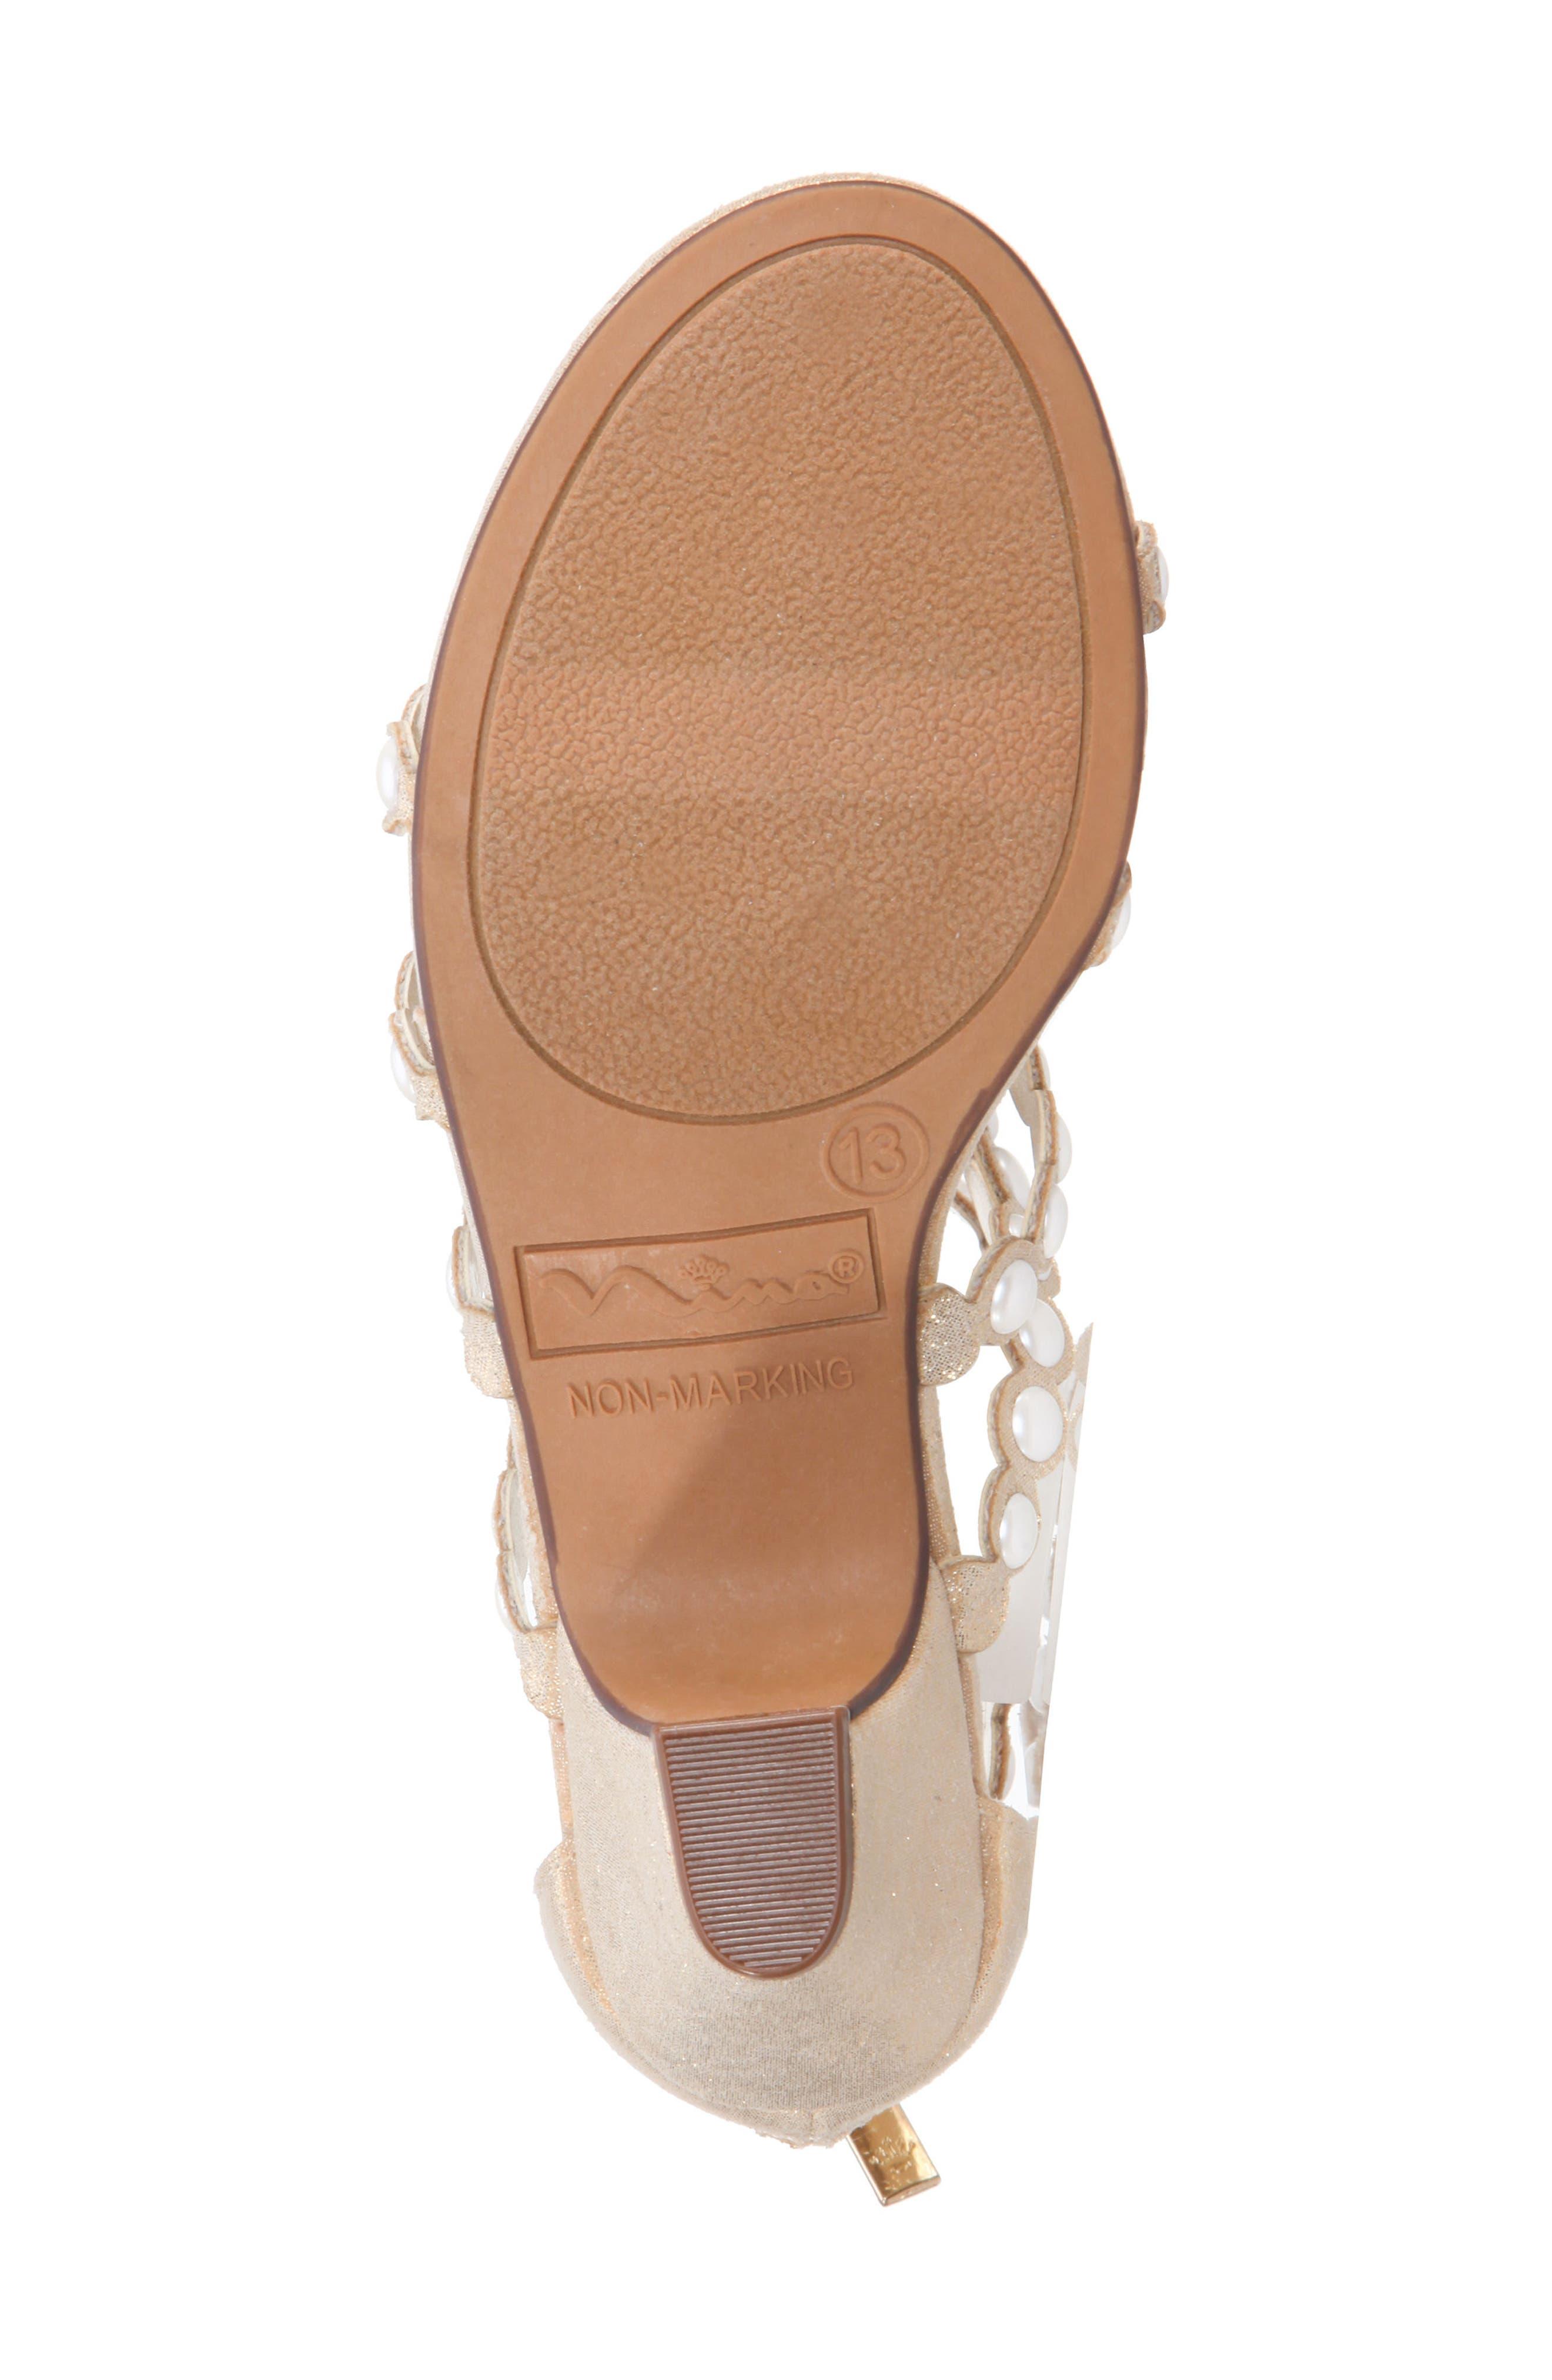 Princess-P Shimmer Sandal,                             Alternate thumbnail 17, color,